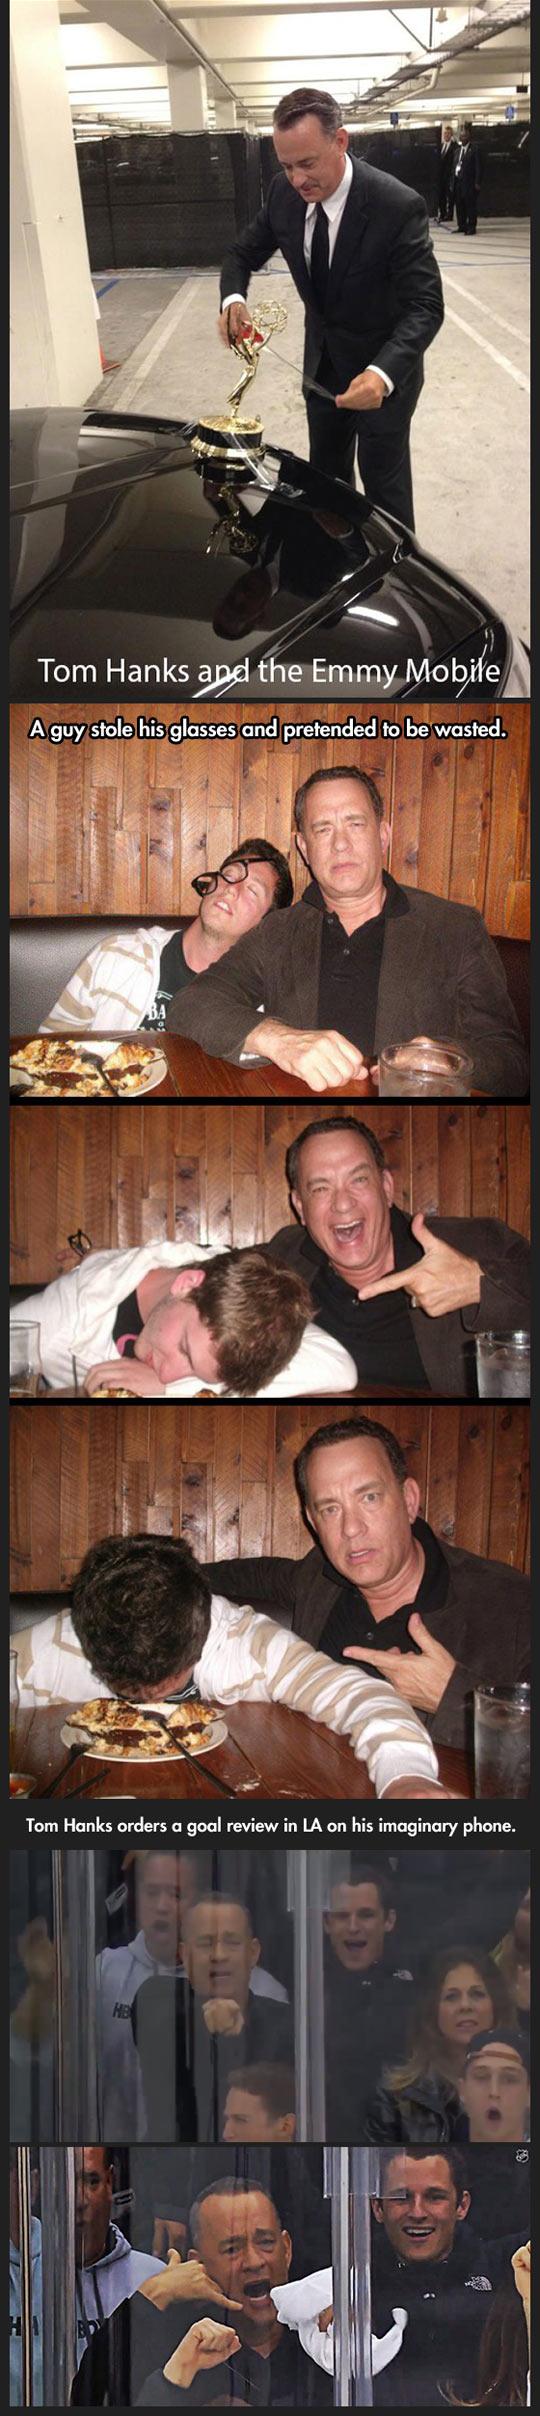 funny-Tom-Hanks-espresso-Emmy